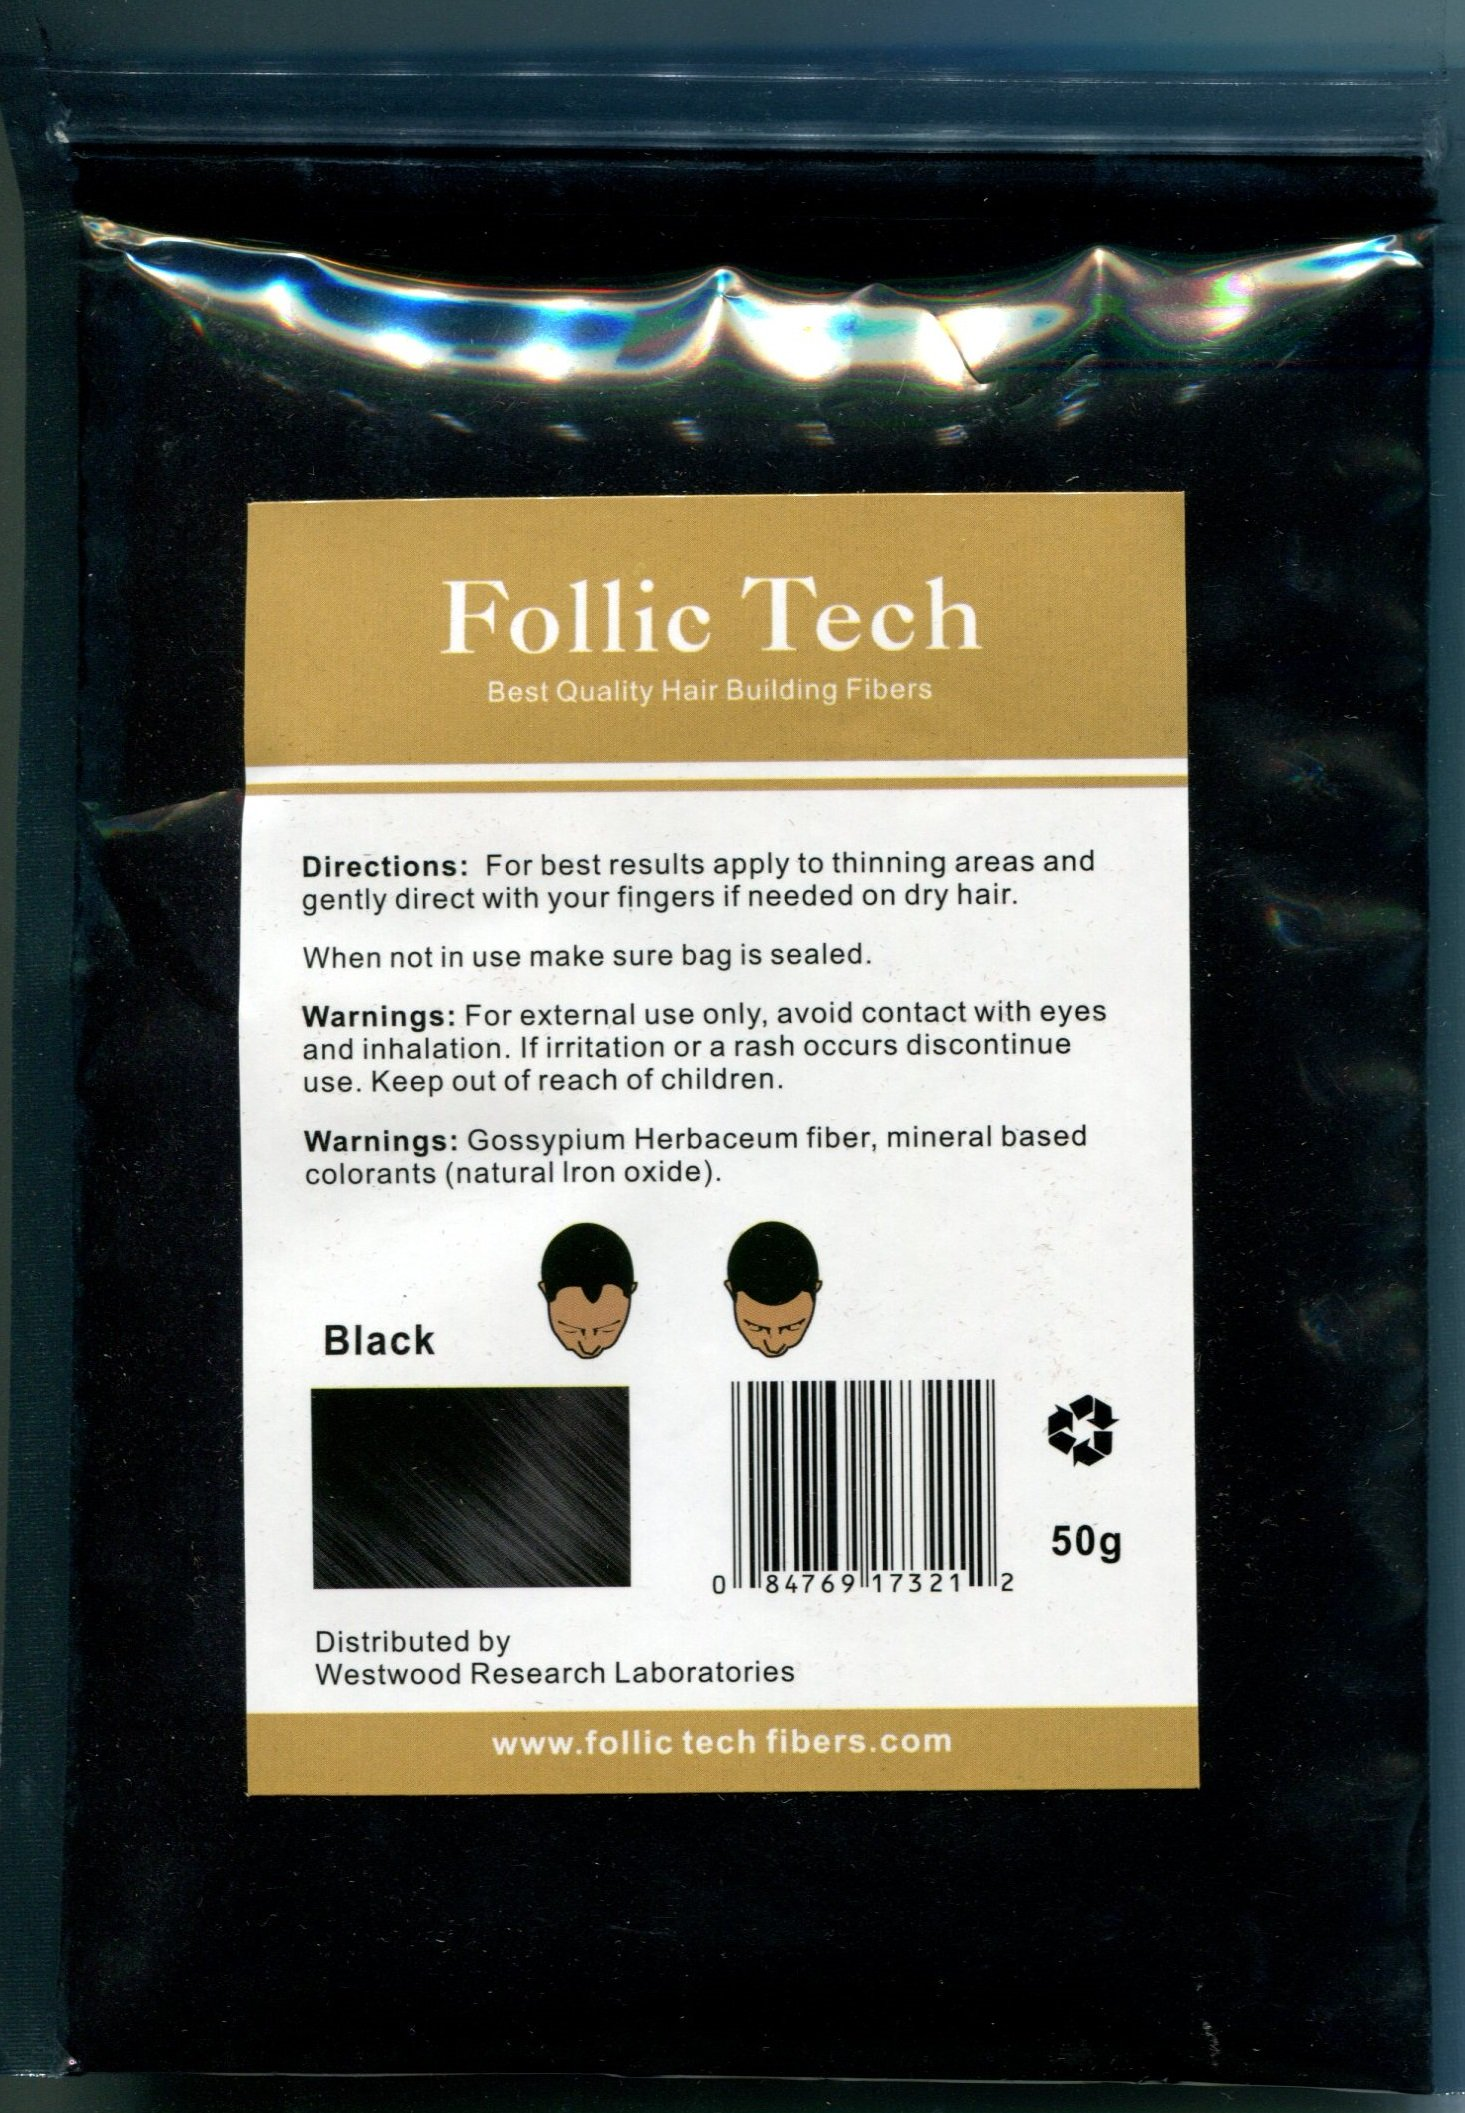 Follic Tech Hair Building Fibers 220 Grams Not 200 Highest Grade Refill Your Bottles from Competitors Like Toppik, Xfusion (Dark brown)